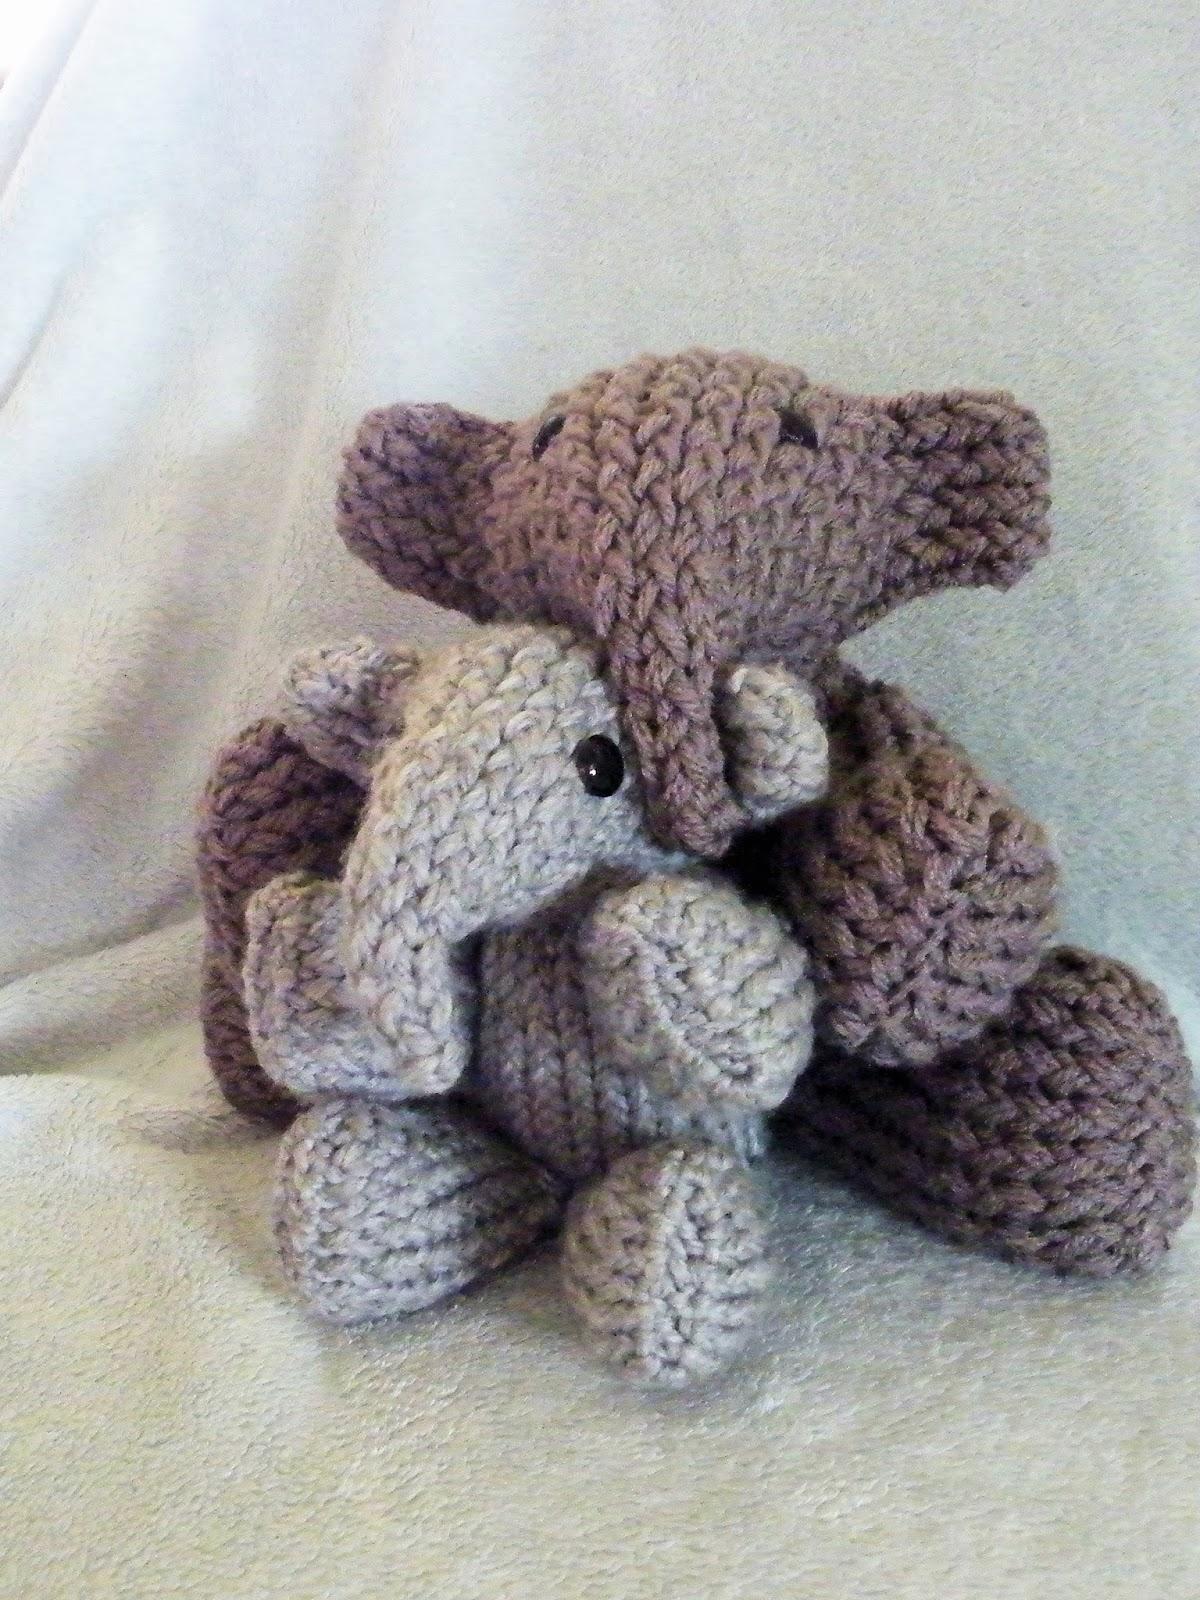 Elephant Ears Knitting Pattern : The Loom Muse : How to Loom and Elephant